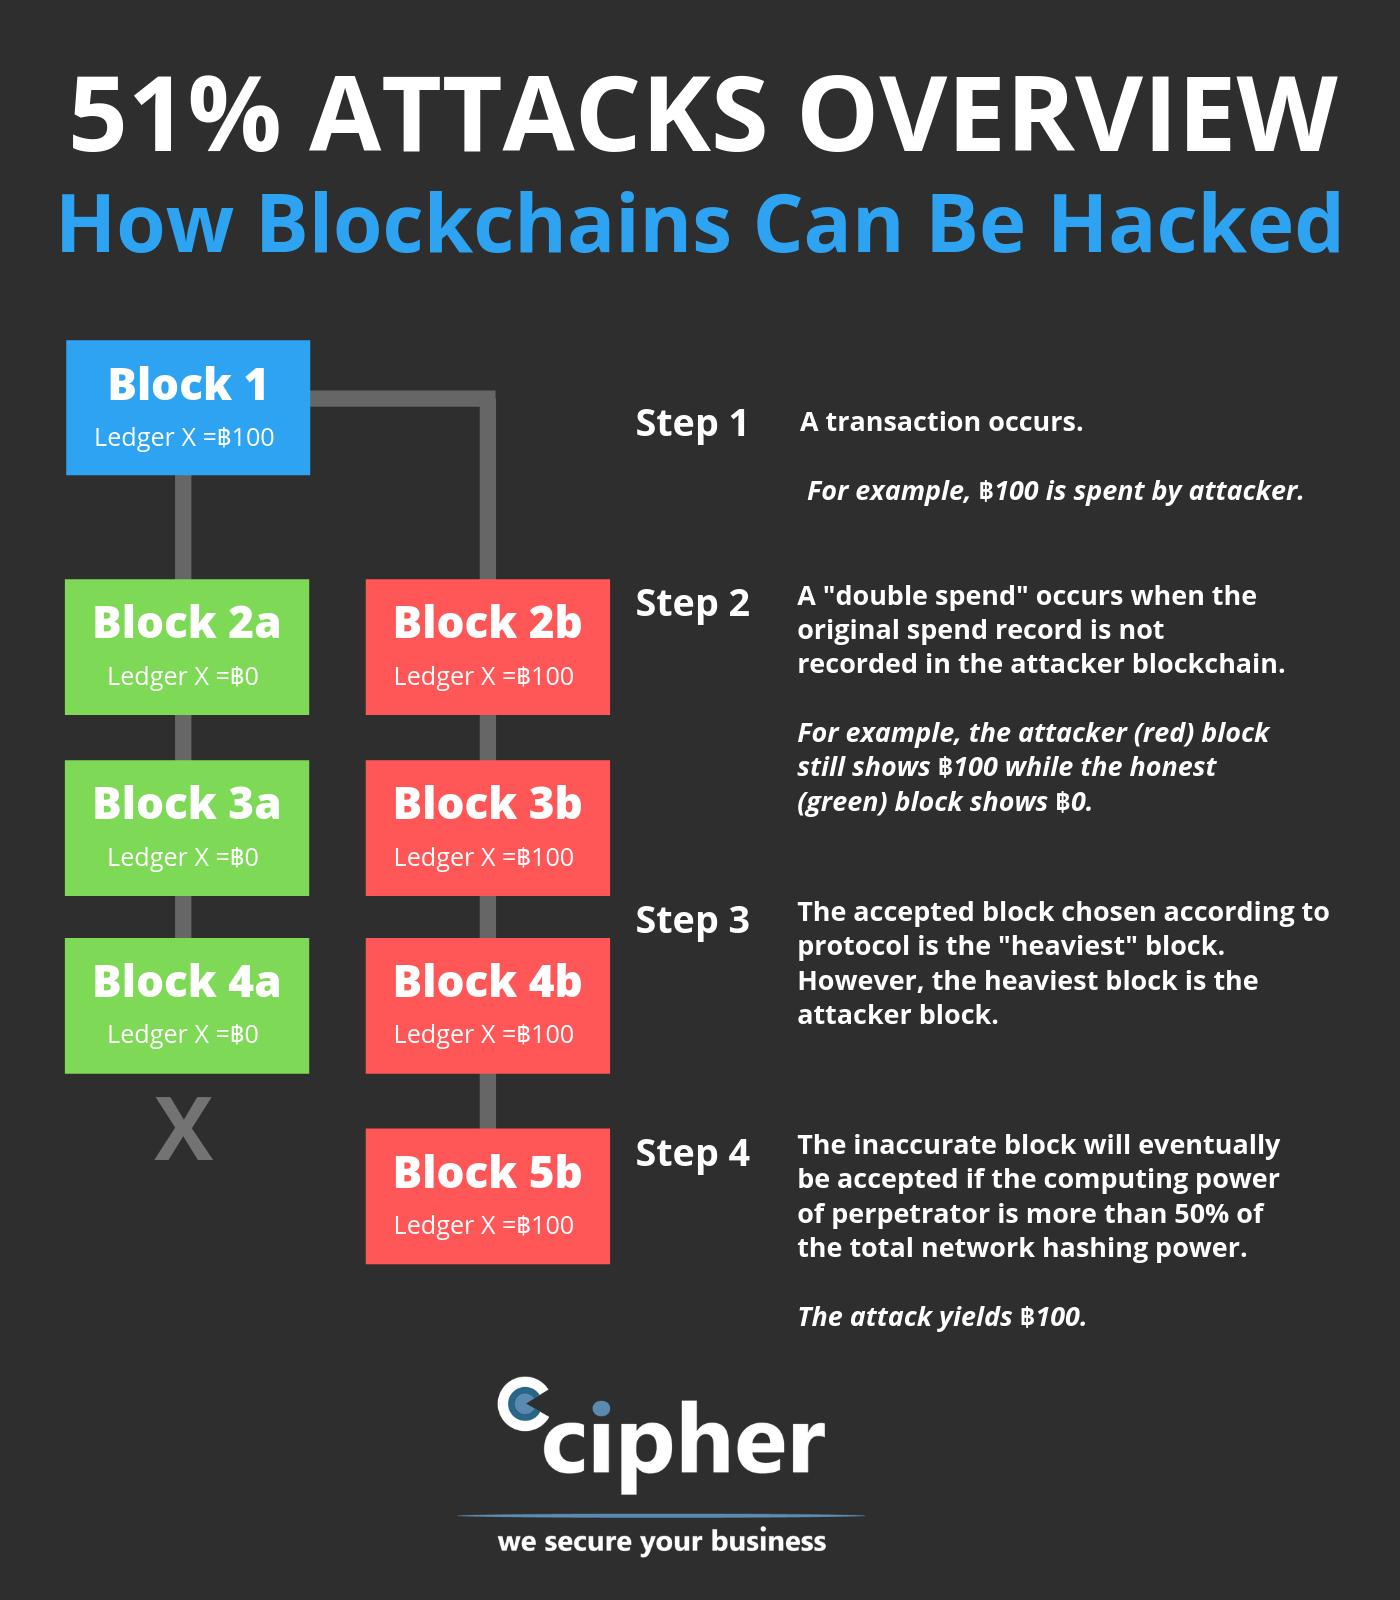 51% Rule for Blockchain